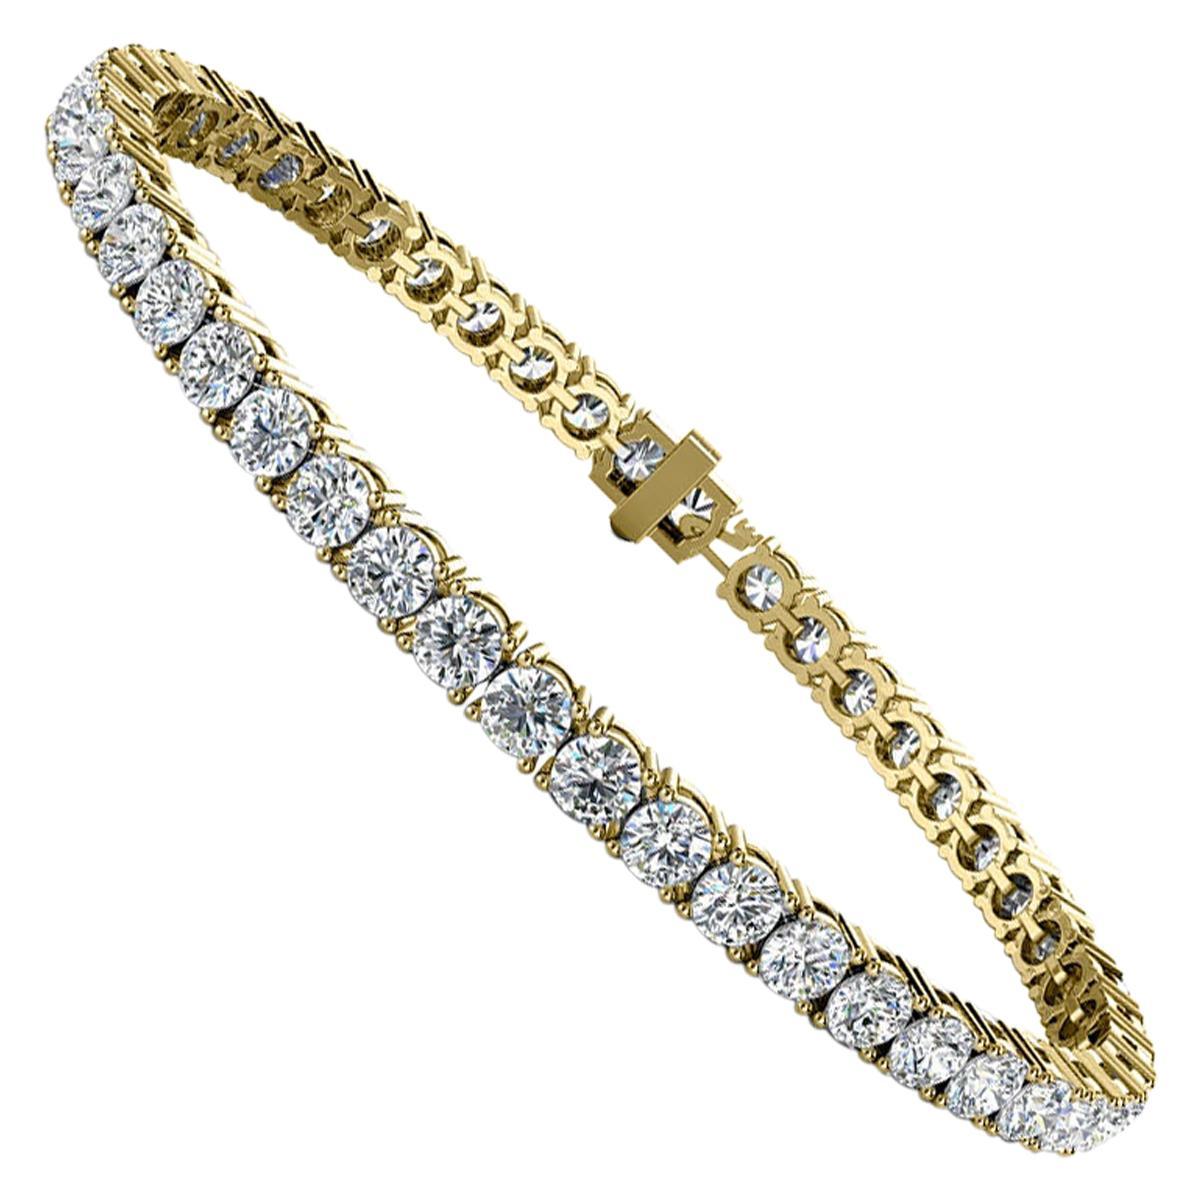 18 Karat Yellow Gold Four Prongs Diamond Tennis Bracelet '7 Carat'